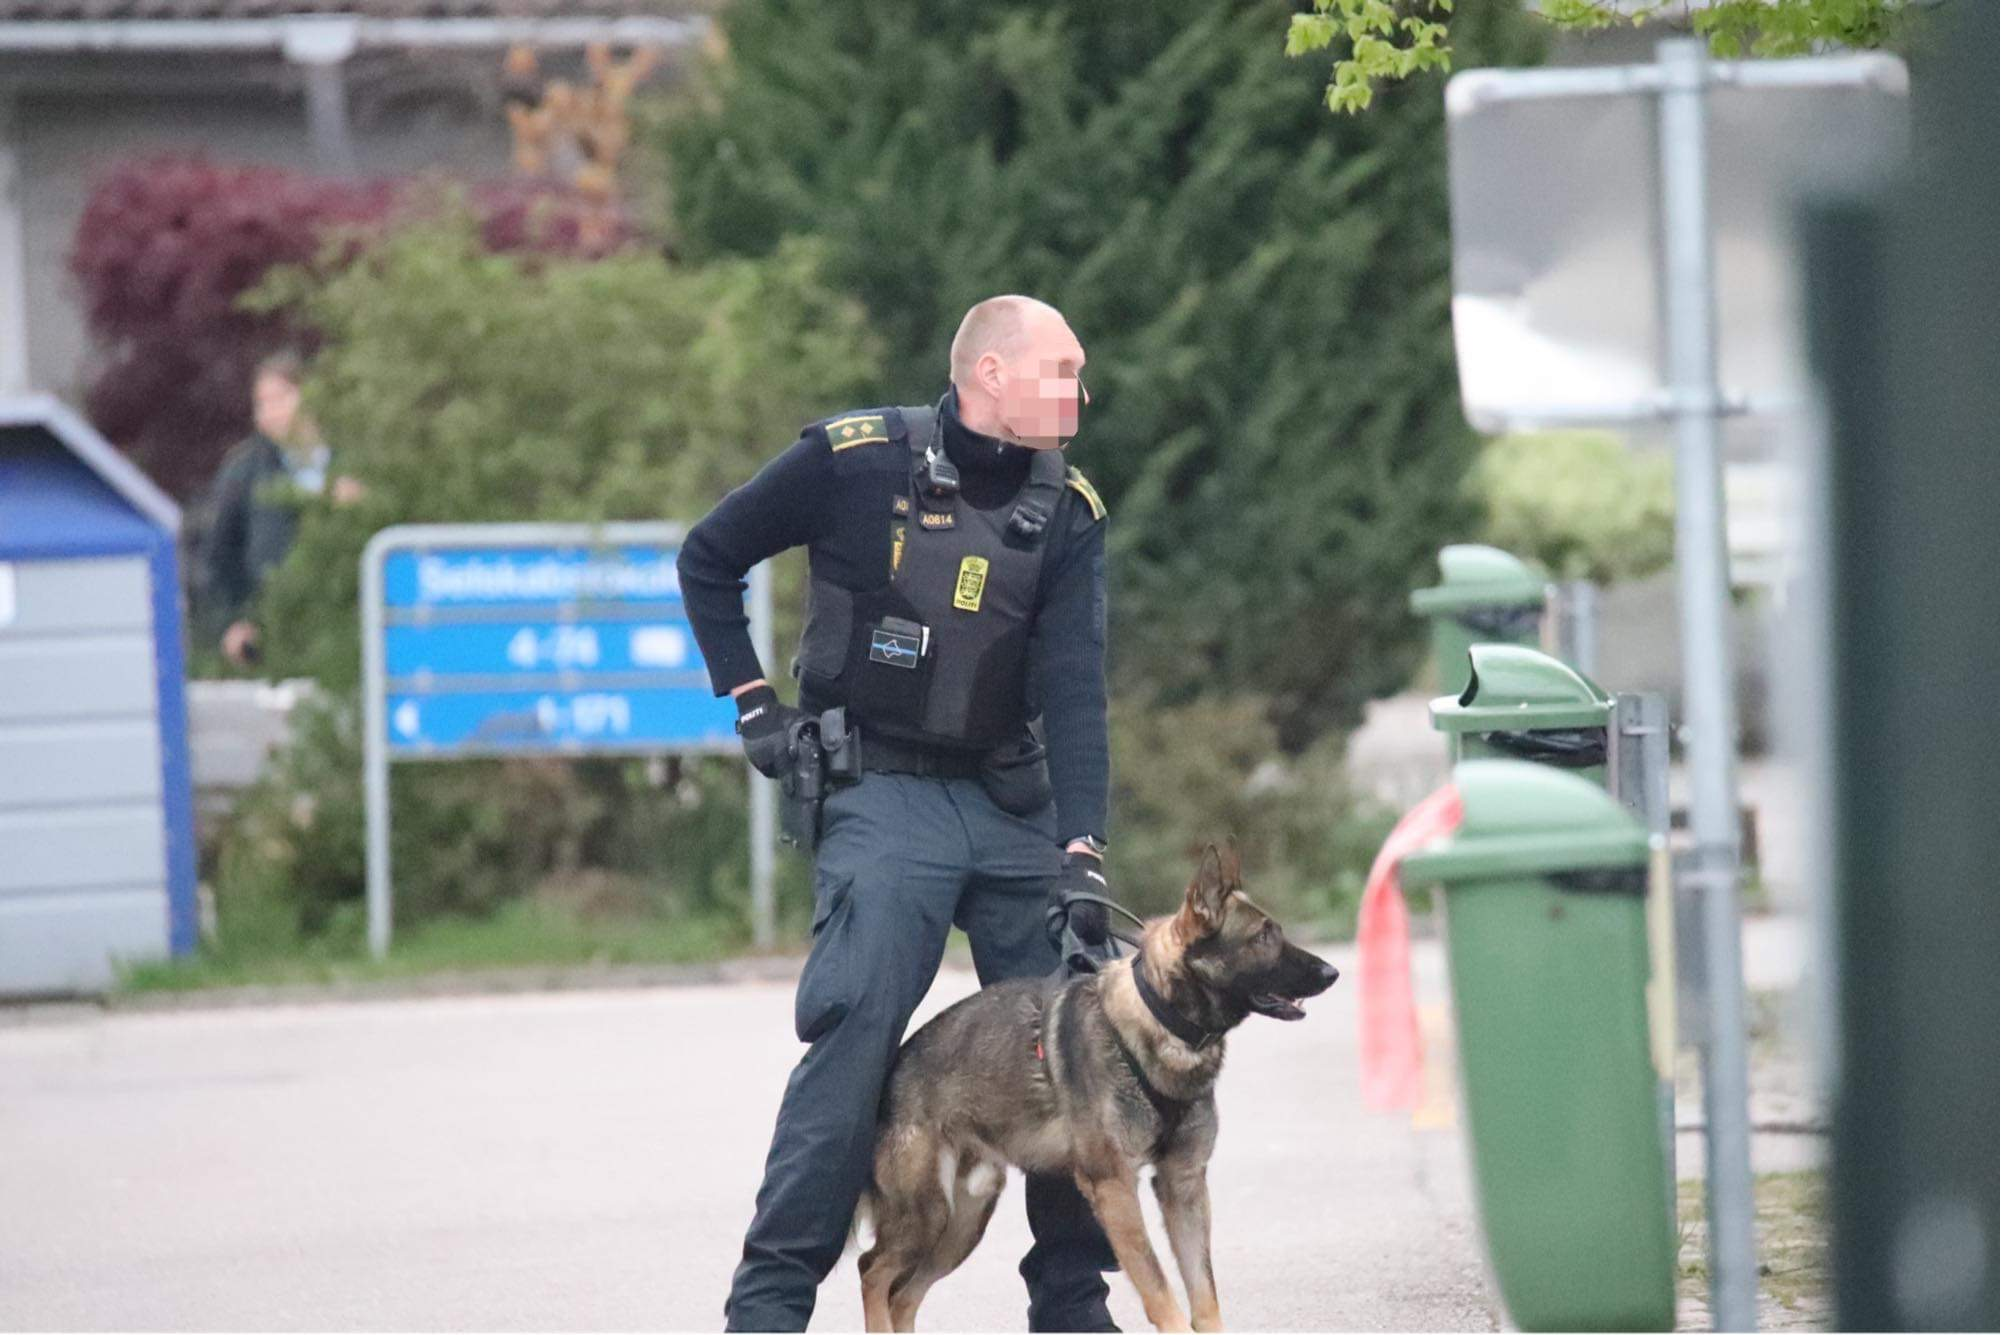 Stor politiaktion - politihund nedlægger mand med kniv